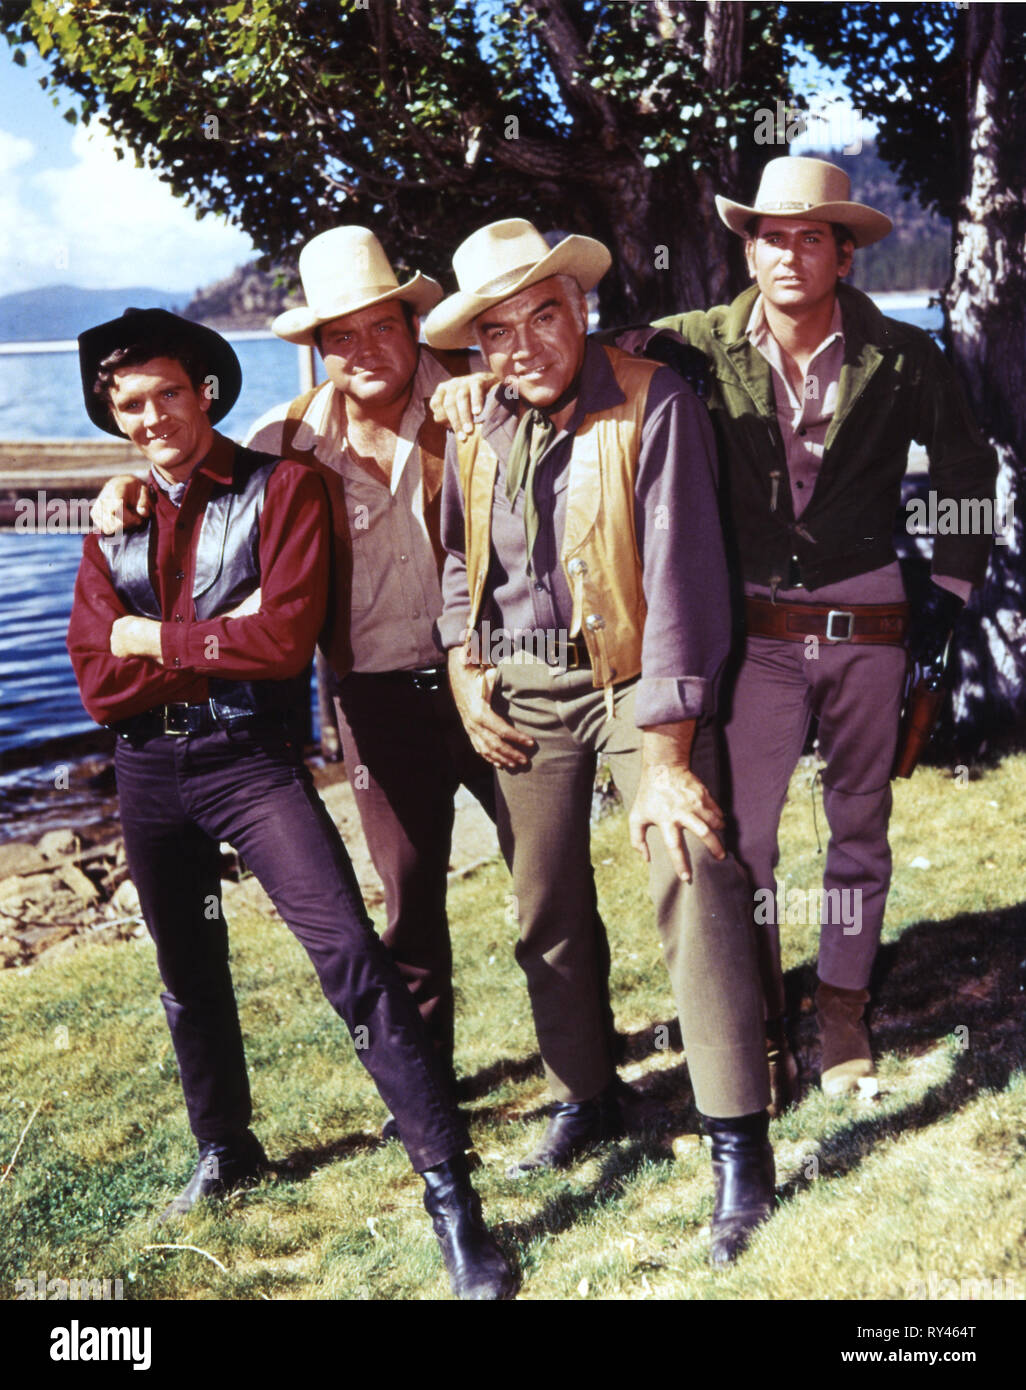 VOGEL,BLOCKER,GREENE,LANDON, BONANZA, 1959 - Stock Image